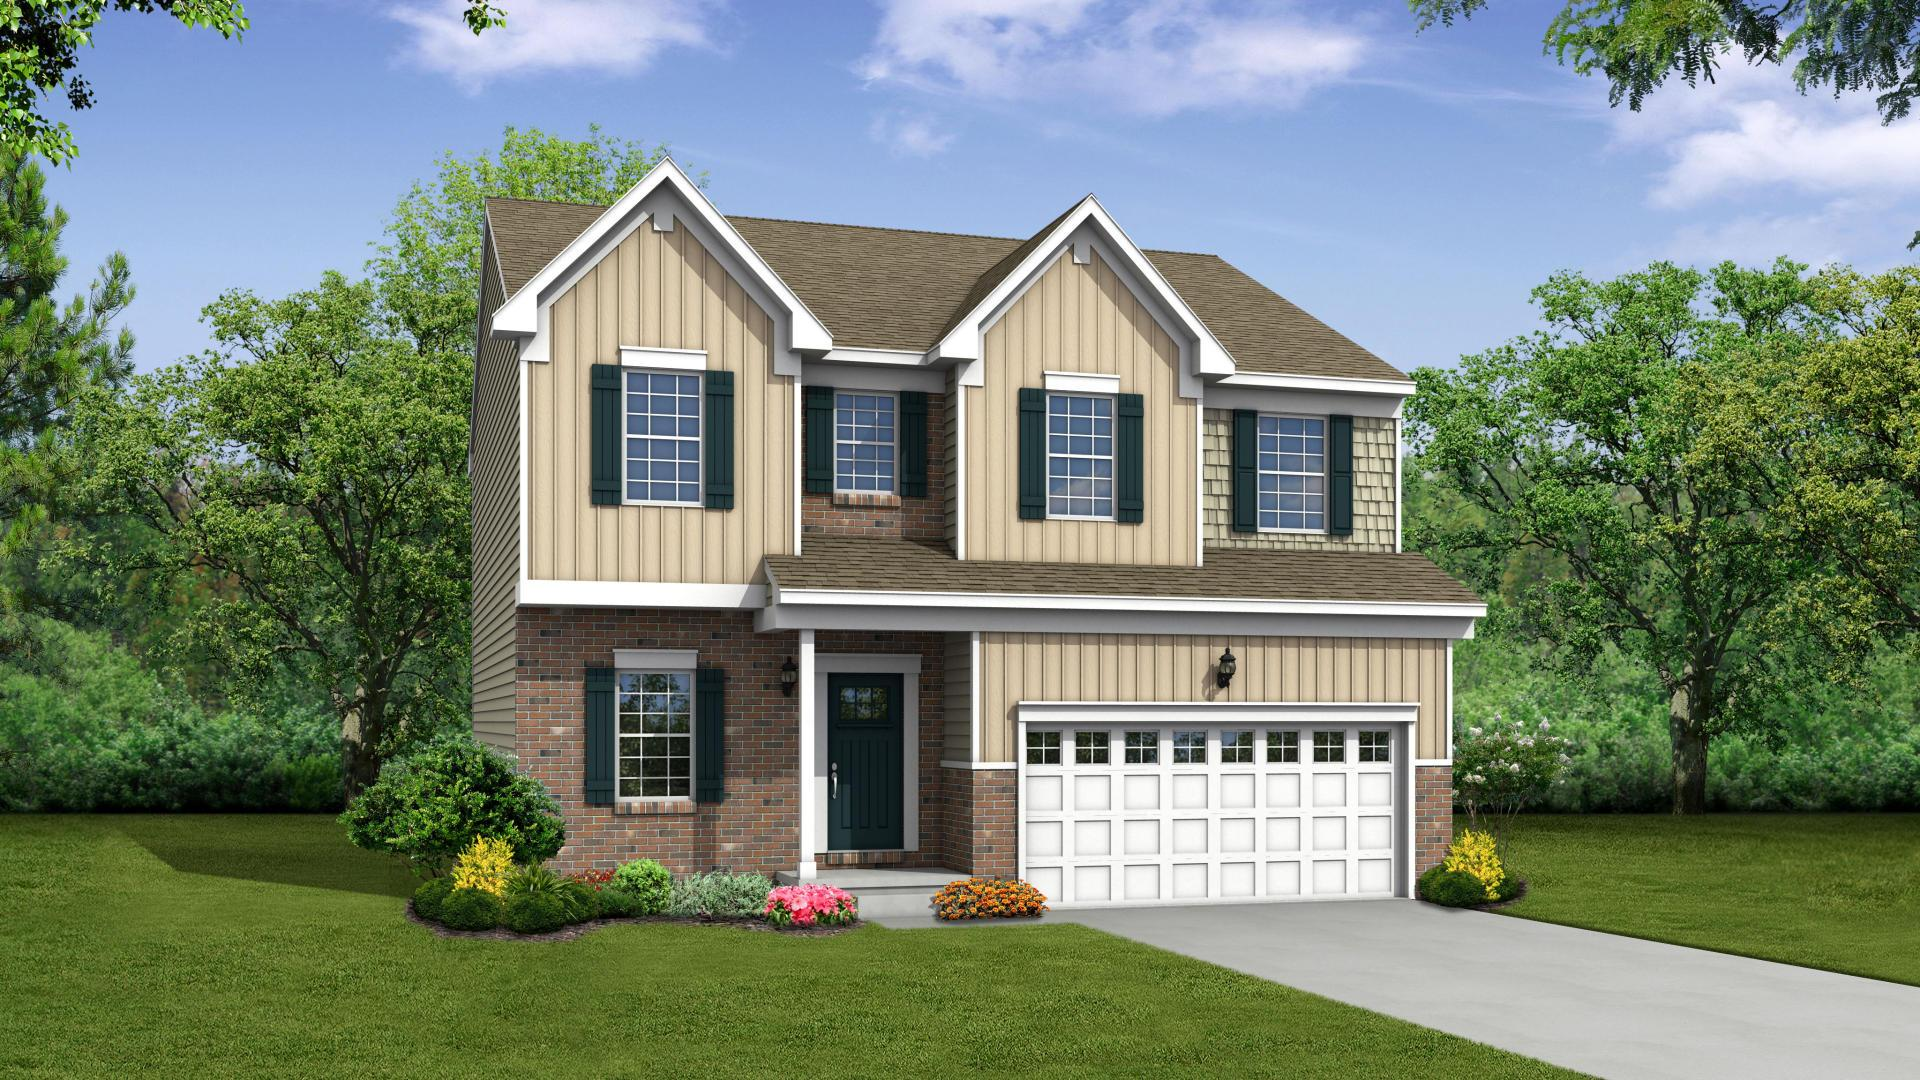 Exterior:Elevation: B Opt Carolina Brick Front, Partial Porch, & Garage Door